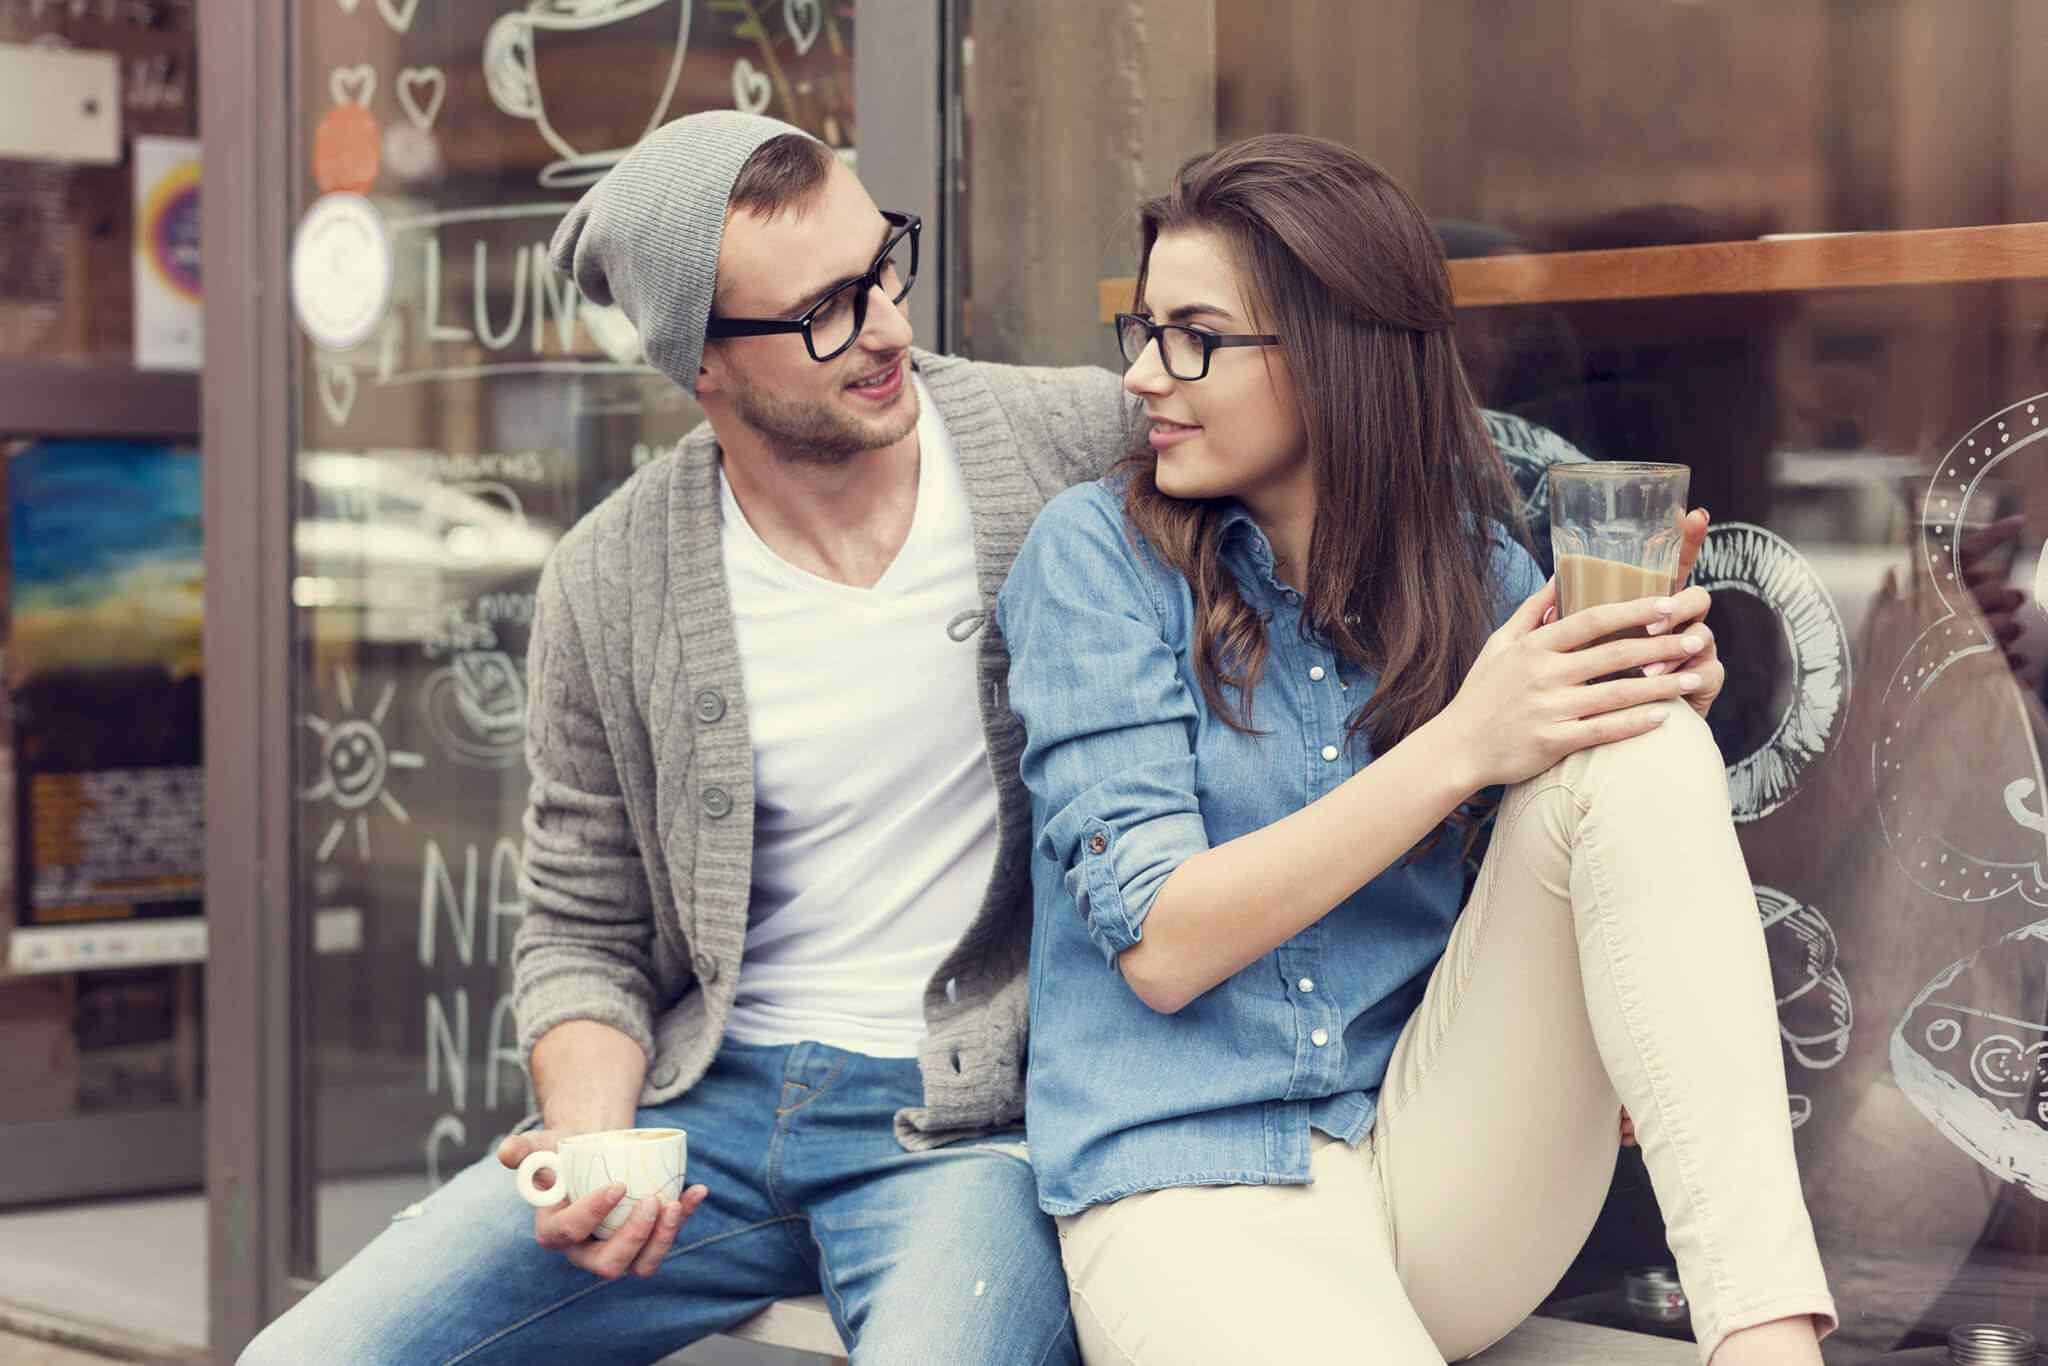 https://www.prepared.sarl/wp-content/uploads/2018/01/img-class-marriage-02.jpg